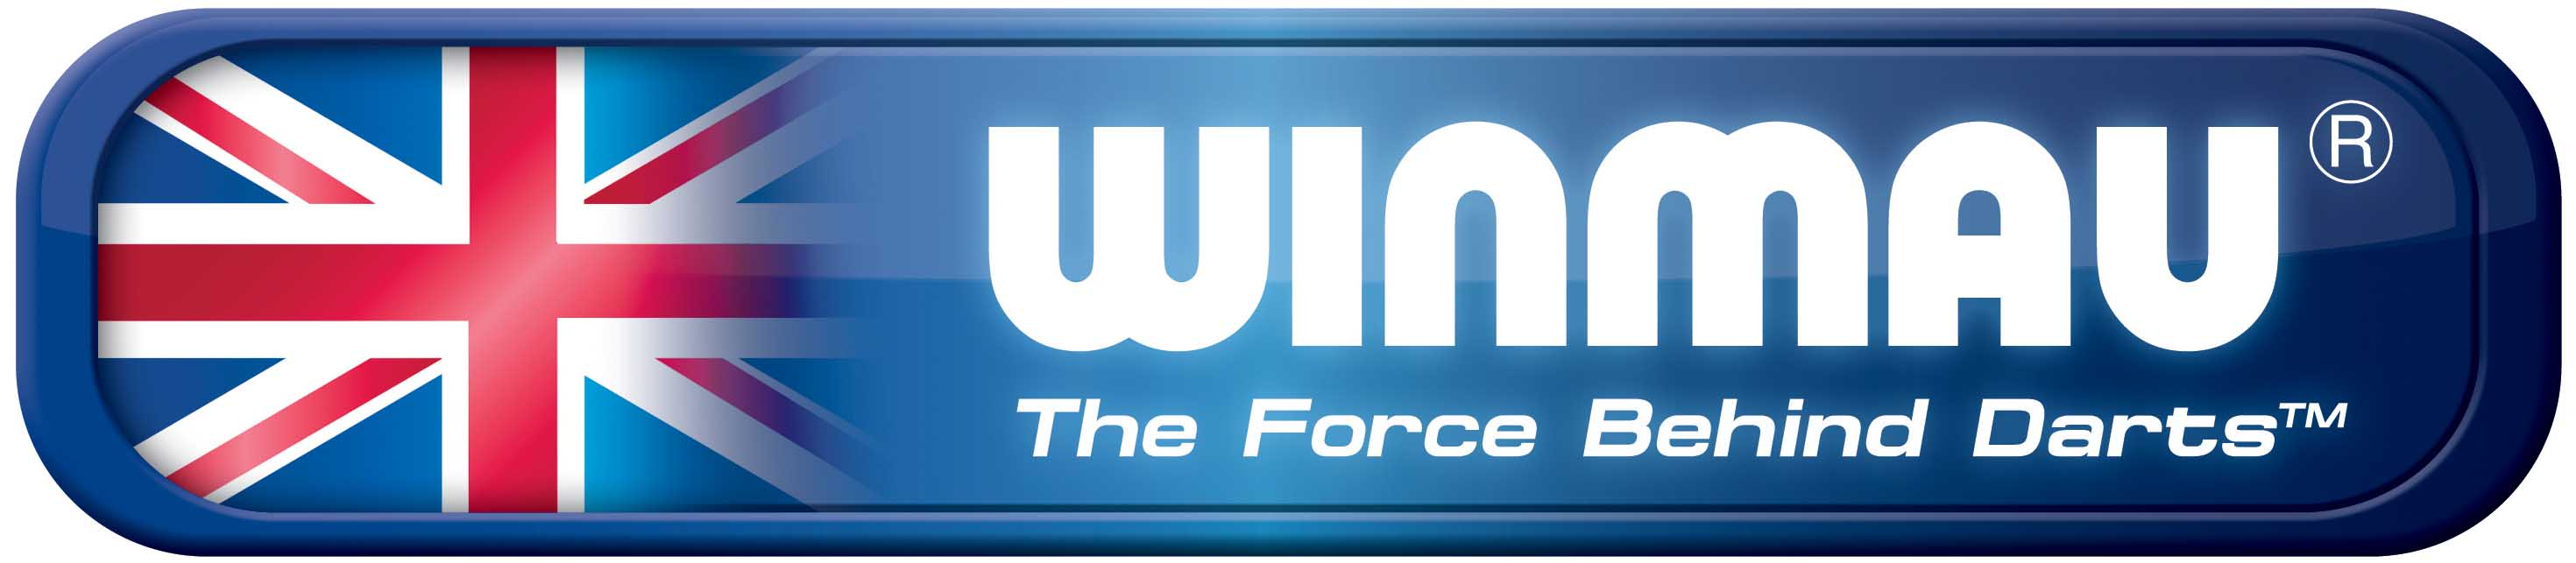 winmau-logo.jpg